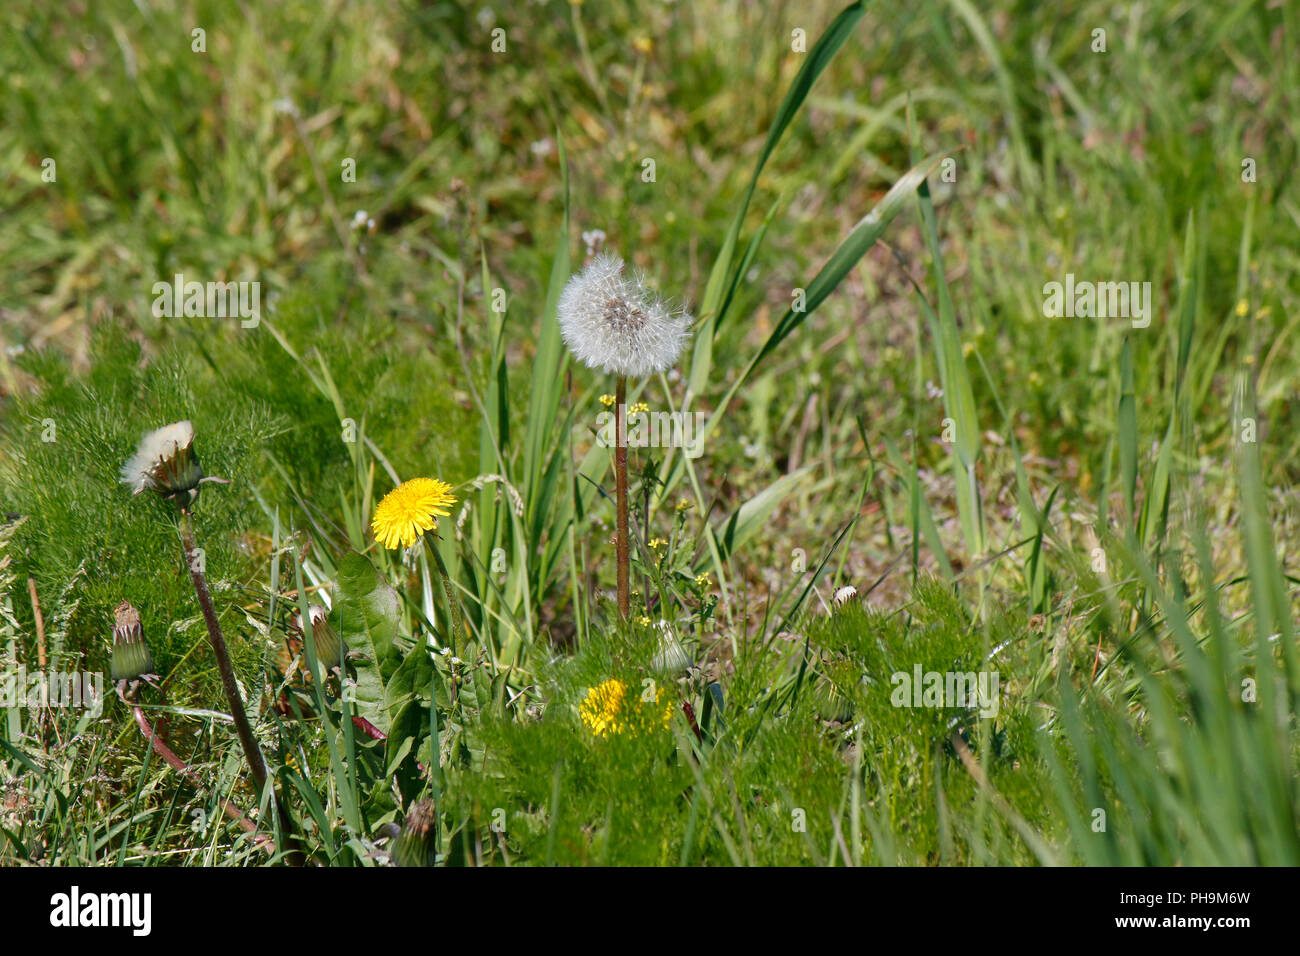 Pusteblume, Muehlenbecker Land, Brandenburg. - Stock Image